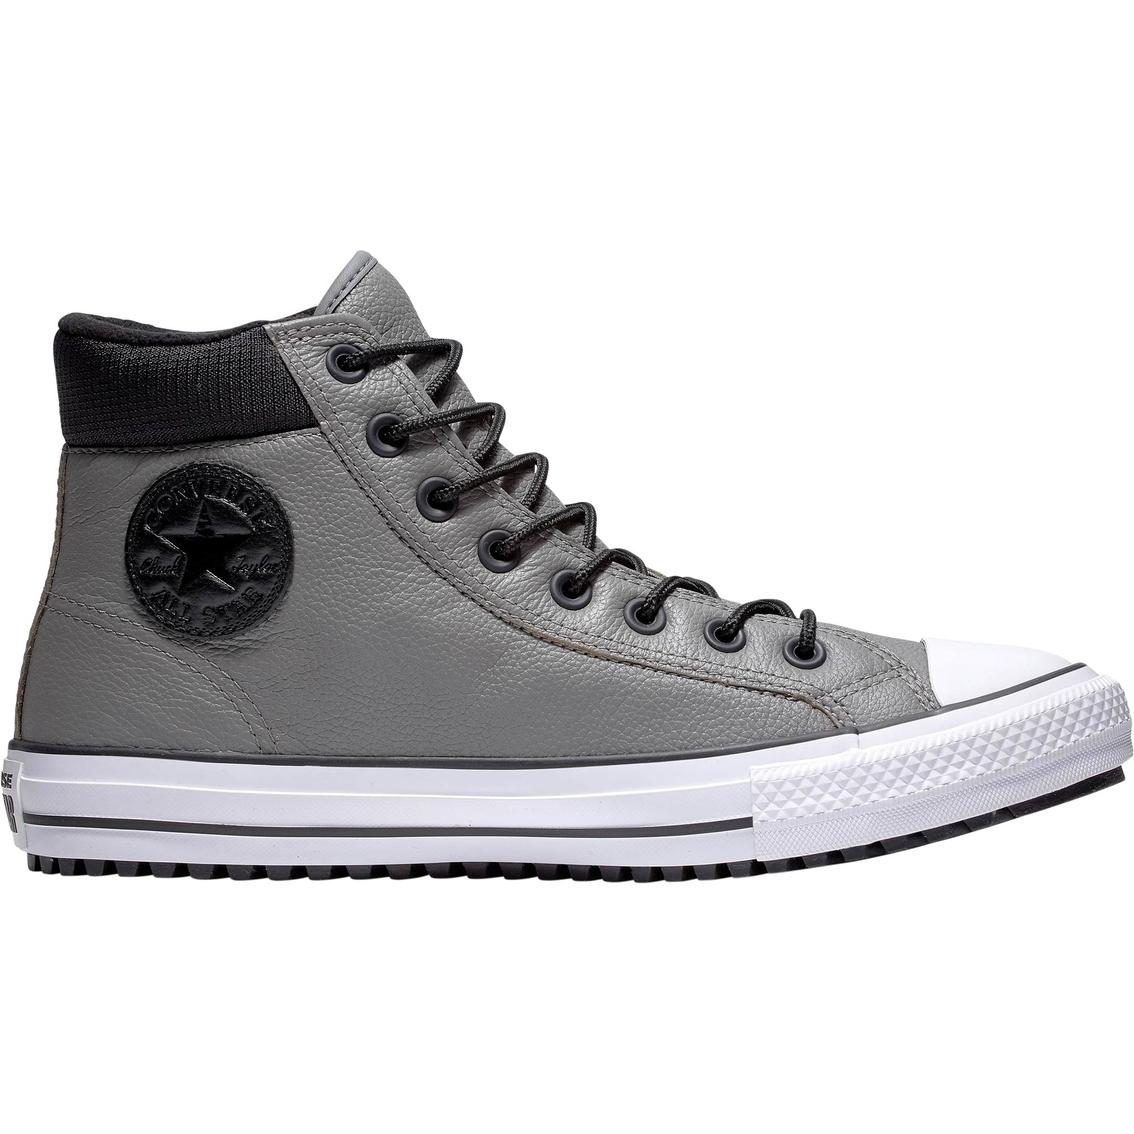 468b66650dcd Converse Men s Chuck Taylor All Star Pc High Top Shoes